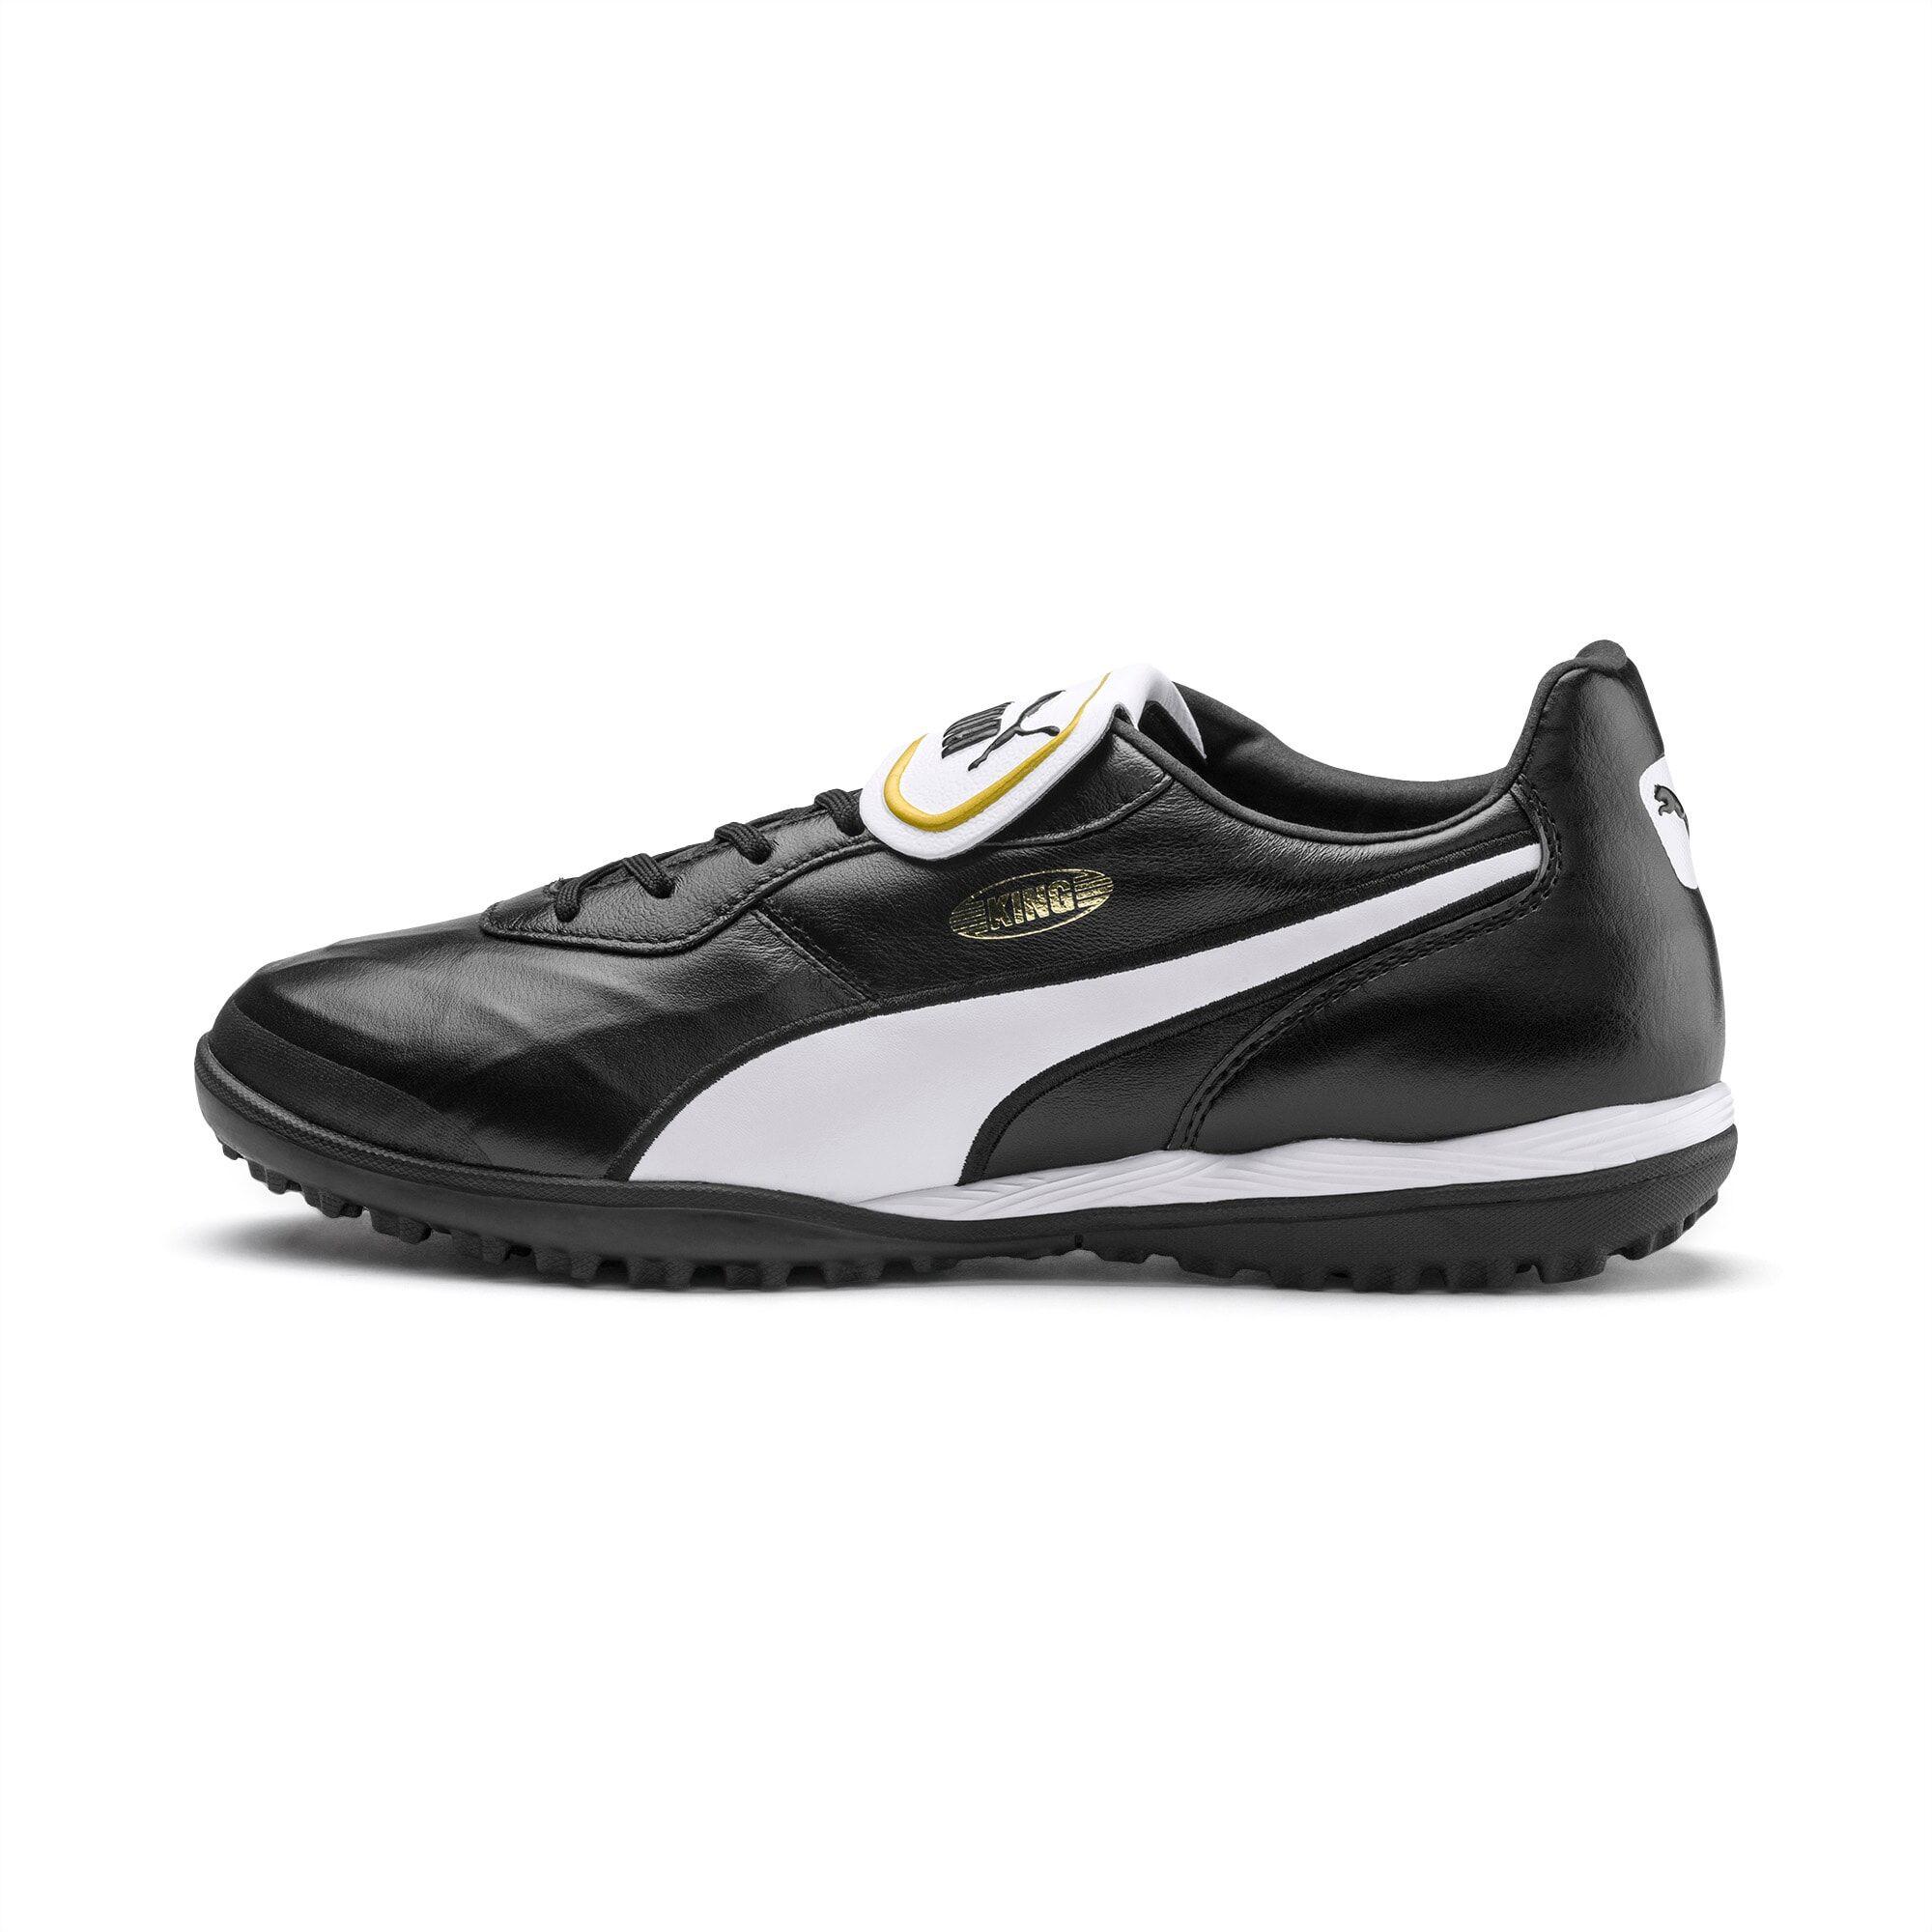 PUMA Chaussure de foot KING TOP TT, Noir/Blanc, Taille 42.5, Vêtements